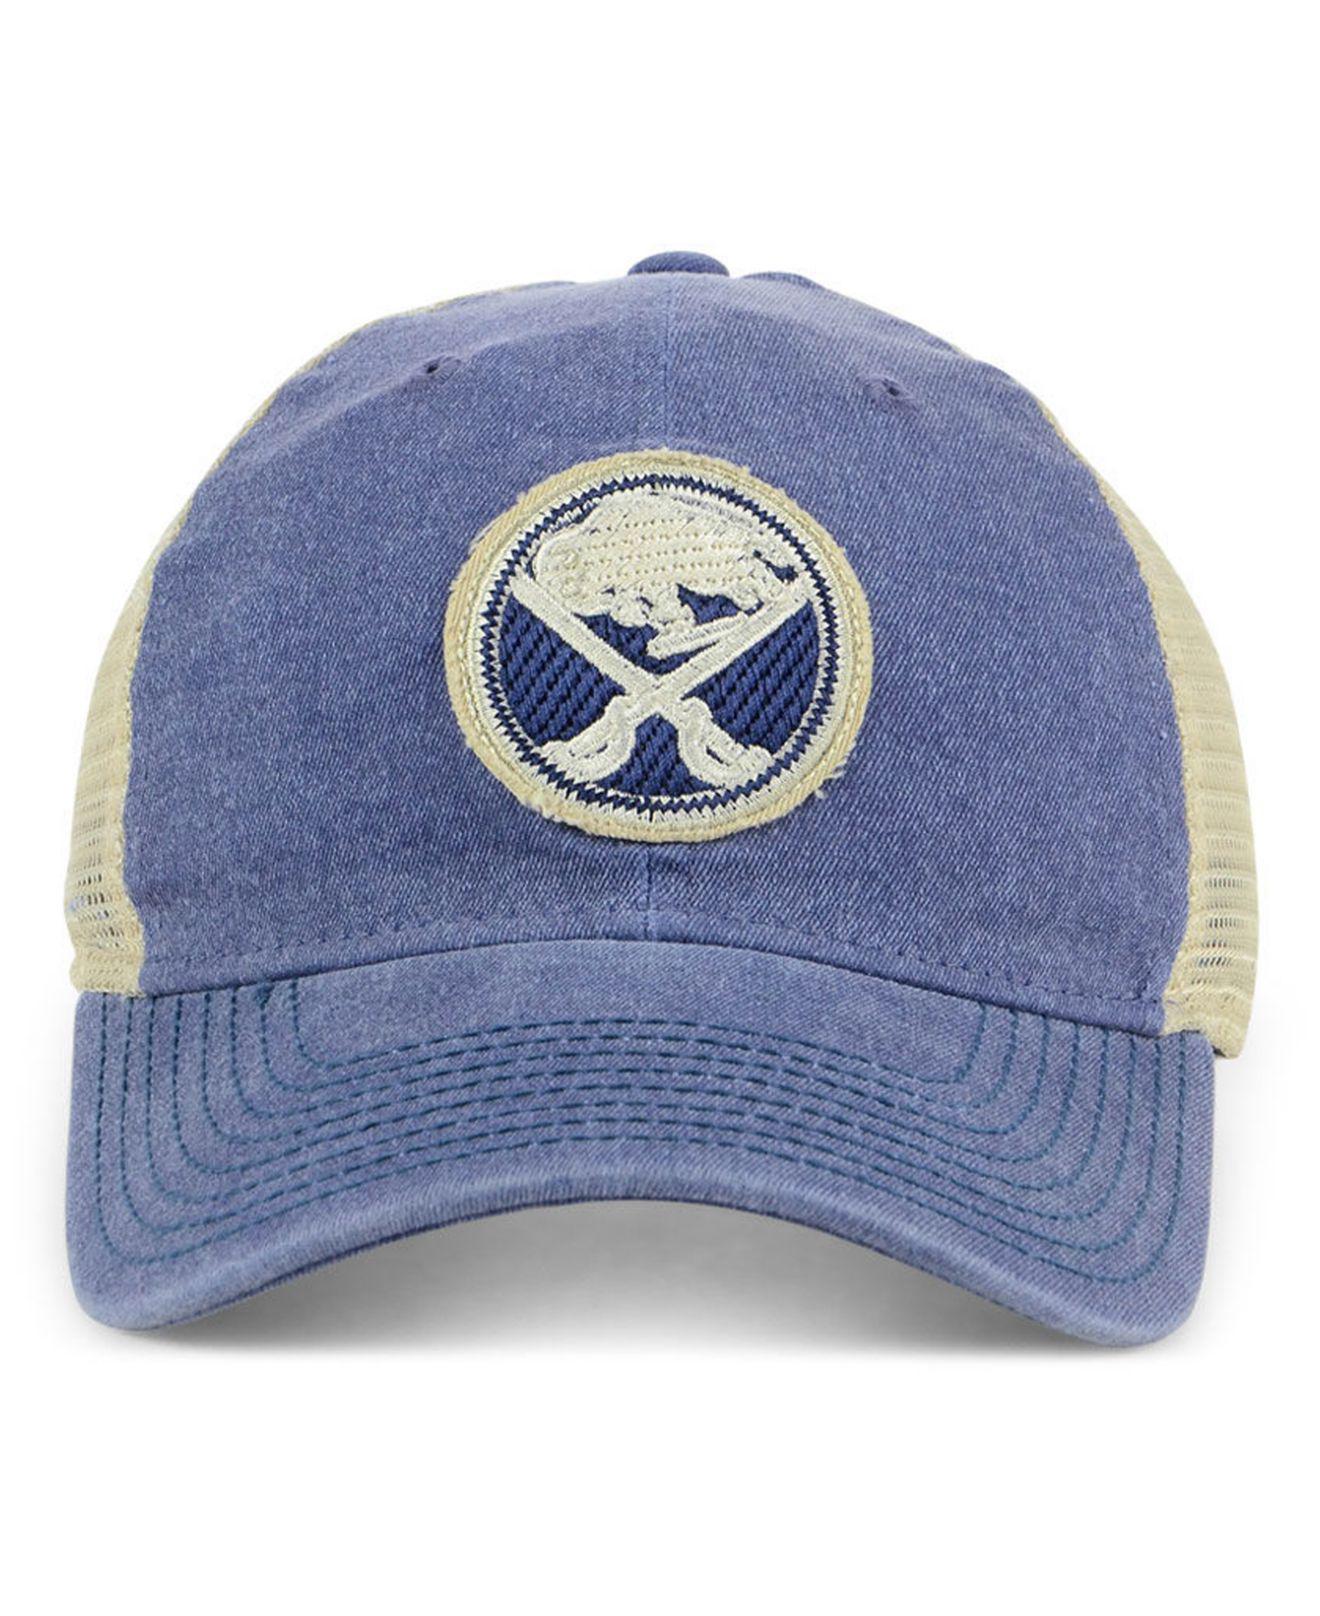 0a5a7beac83b1 ... locker room structured flex cap cedfc e354b  france lyst adidas buffalo  sabres sun bleached slouch cap in blue for men 70b55 b4271